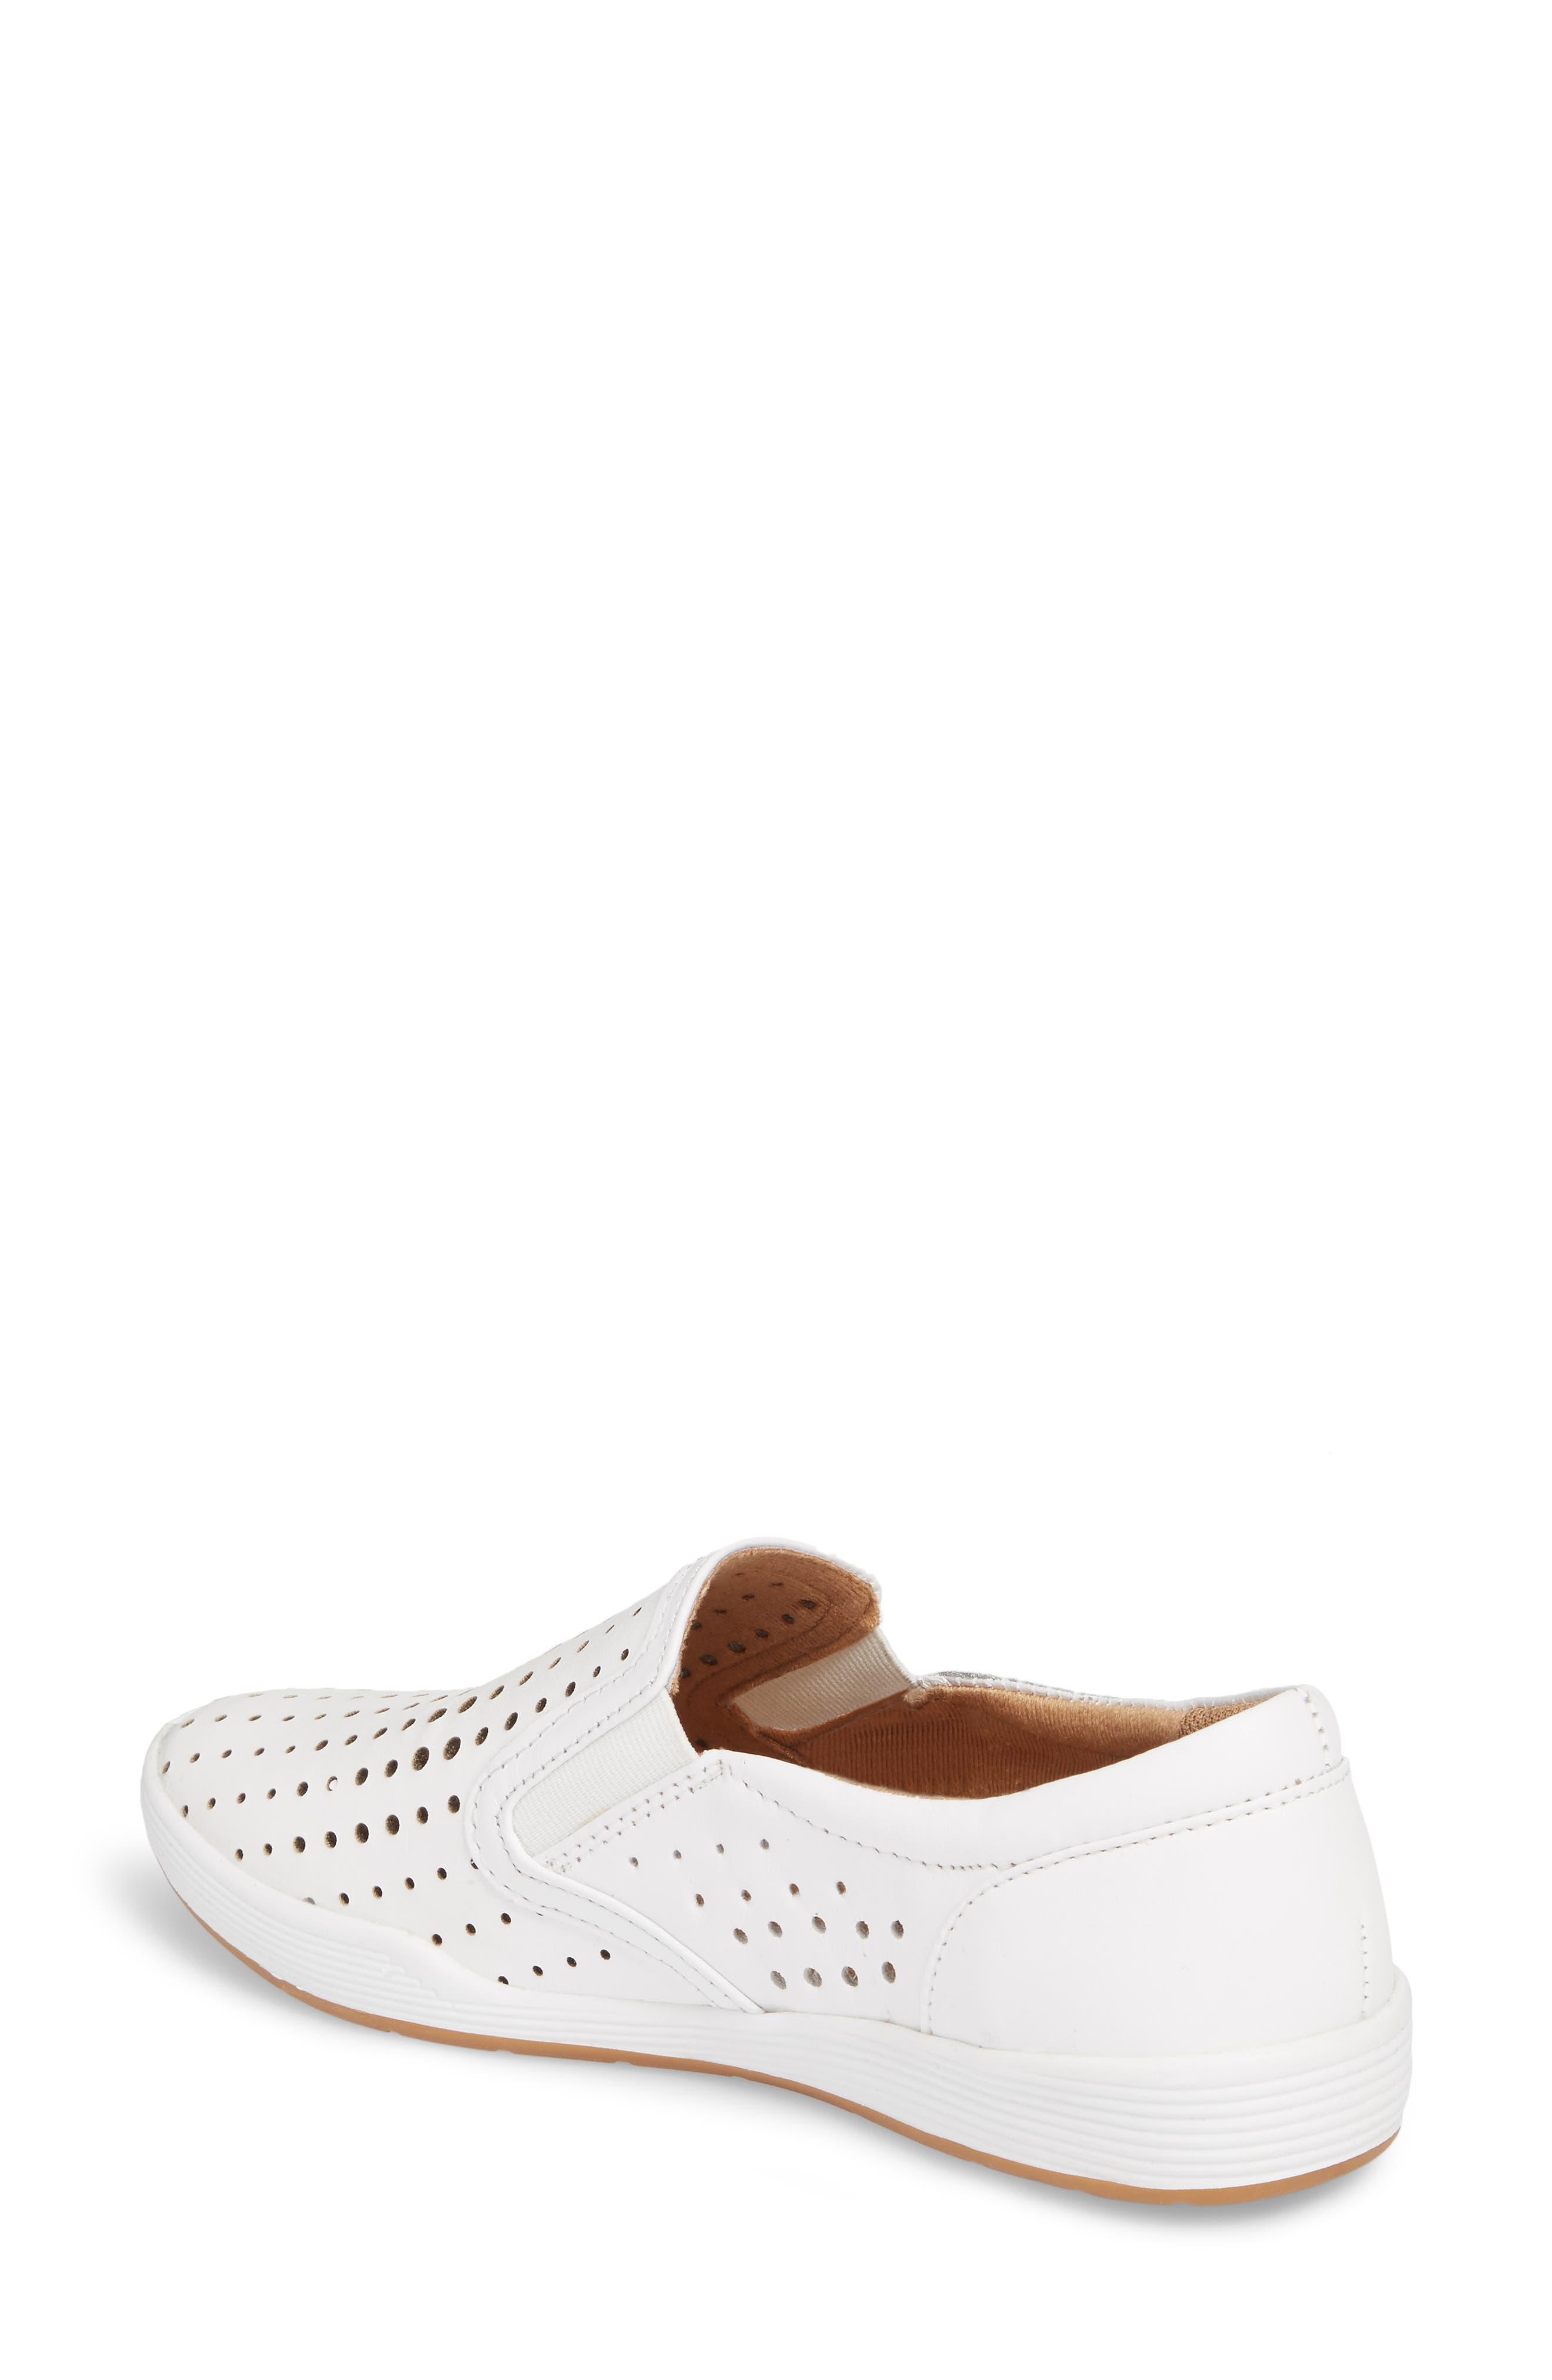 Lyra Perforated Slip-On Sneaker,                             Alternate thumbnail 2, color,                             White Leather